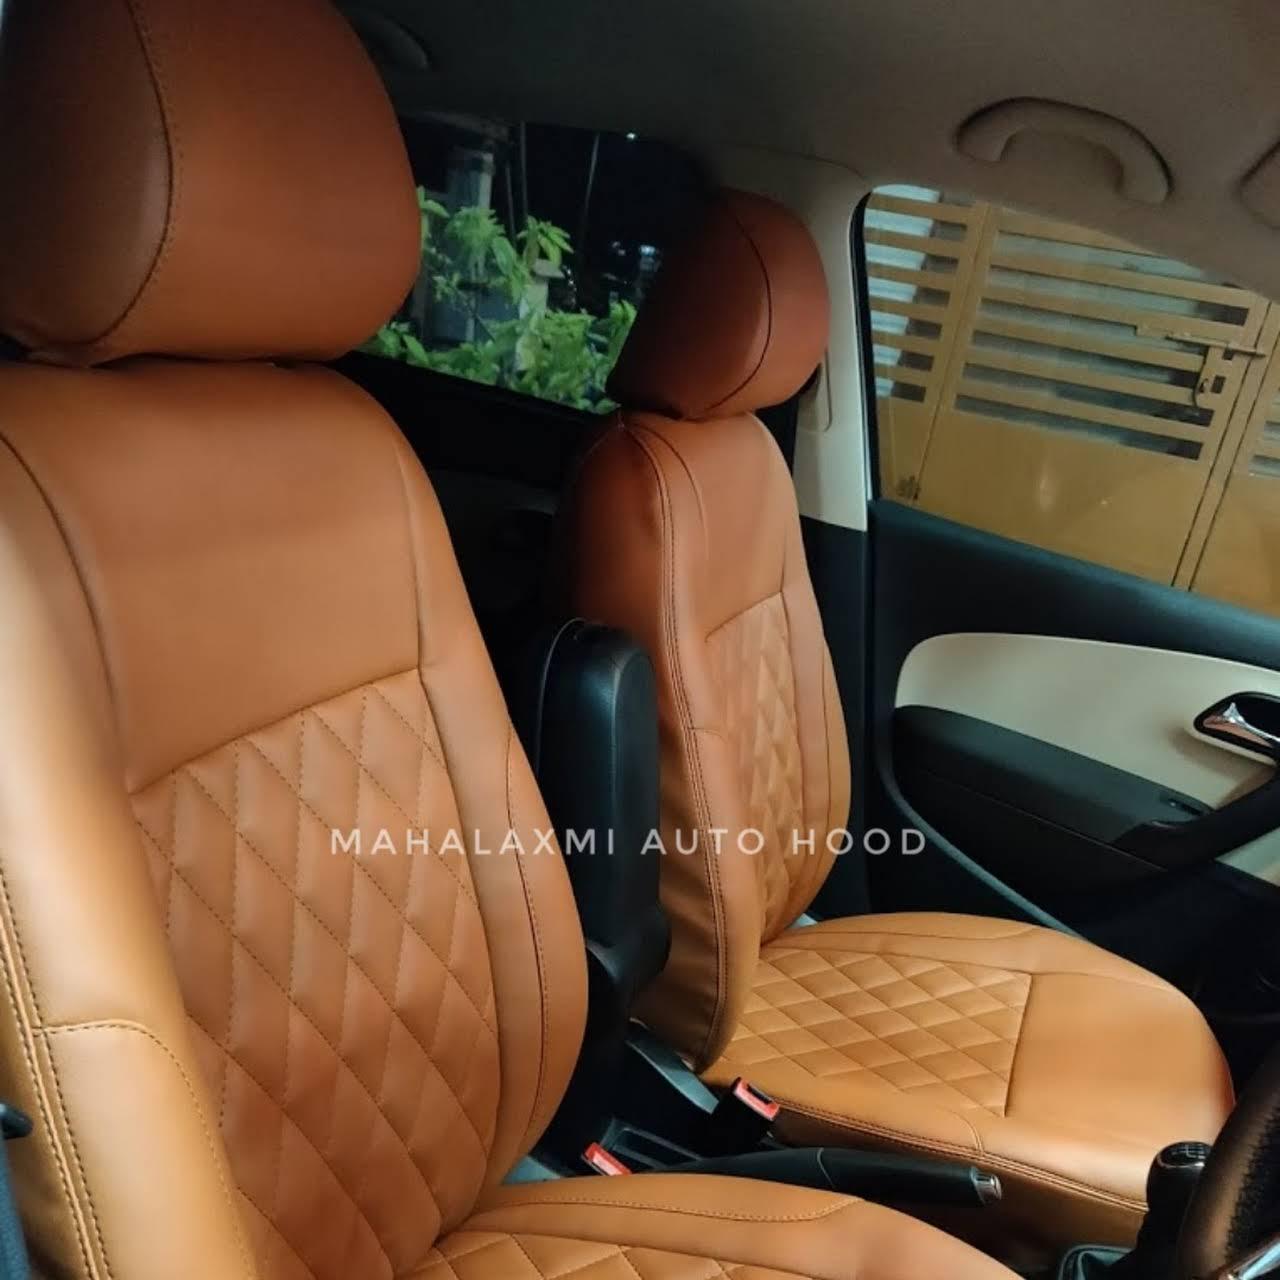 Phenomenal Mahalaxmi Auto Hood All Kinds Of Latest Car Seat Covers Bralicious Painted Fabric Chair Ideas Braliciousco